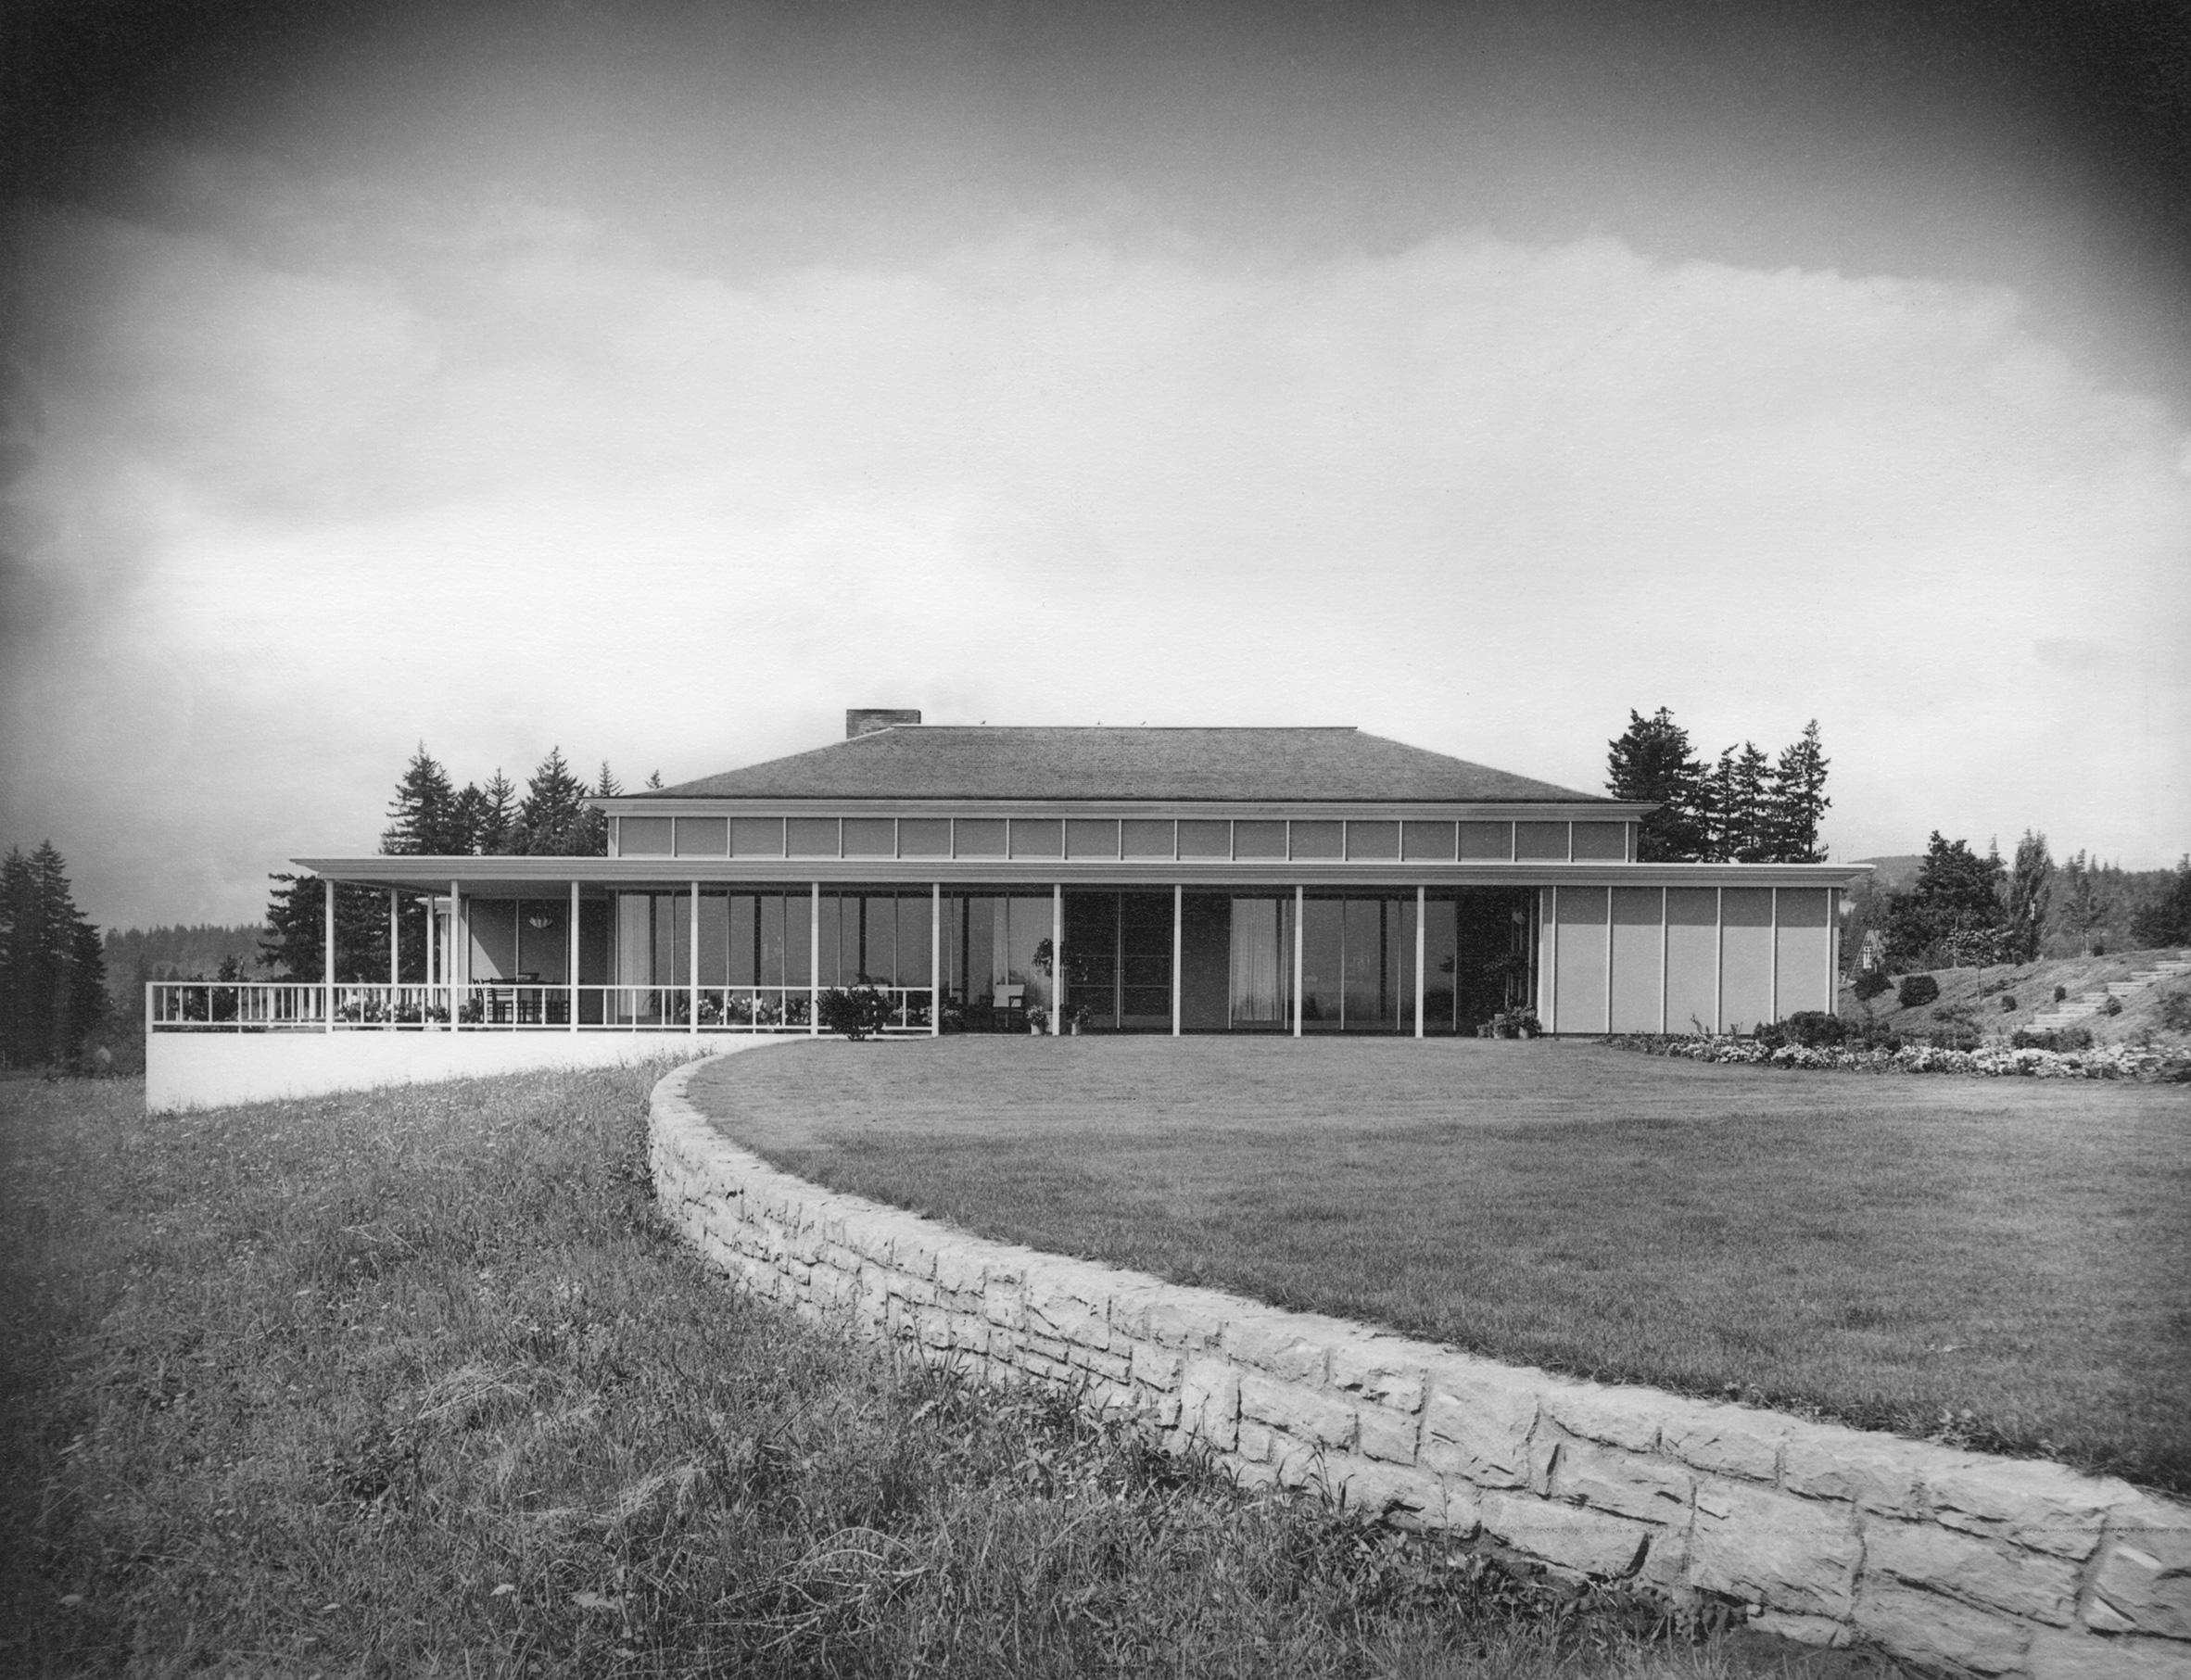 Lawrence and Anne Kistner Shaw House, Lake Oswego, Oregon, 1950